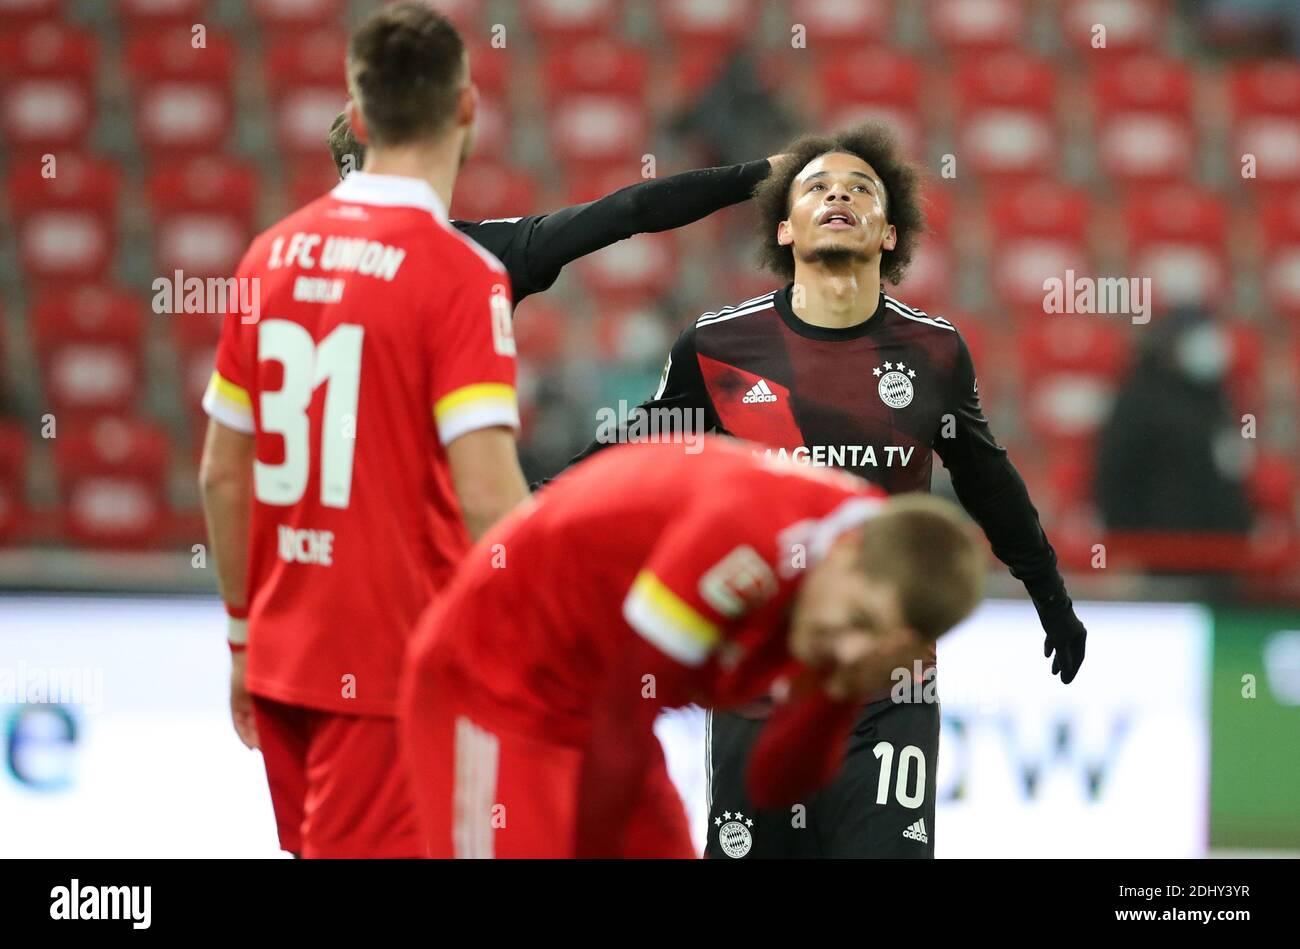 Berlín, Alemania. 12 de diciembre de 2020. Leroy Sane FC Bayern Munich FC Unión Berlín - FC Bayern Munich 12.12.2020 estadio an der alten Foersterei Fútbol 1 . Bundesliga Saison 2020 / 2021 crédito : diebilderwelt / Alamy Live News Foto de stock